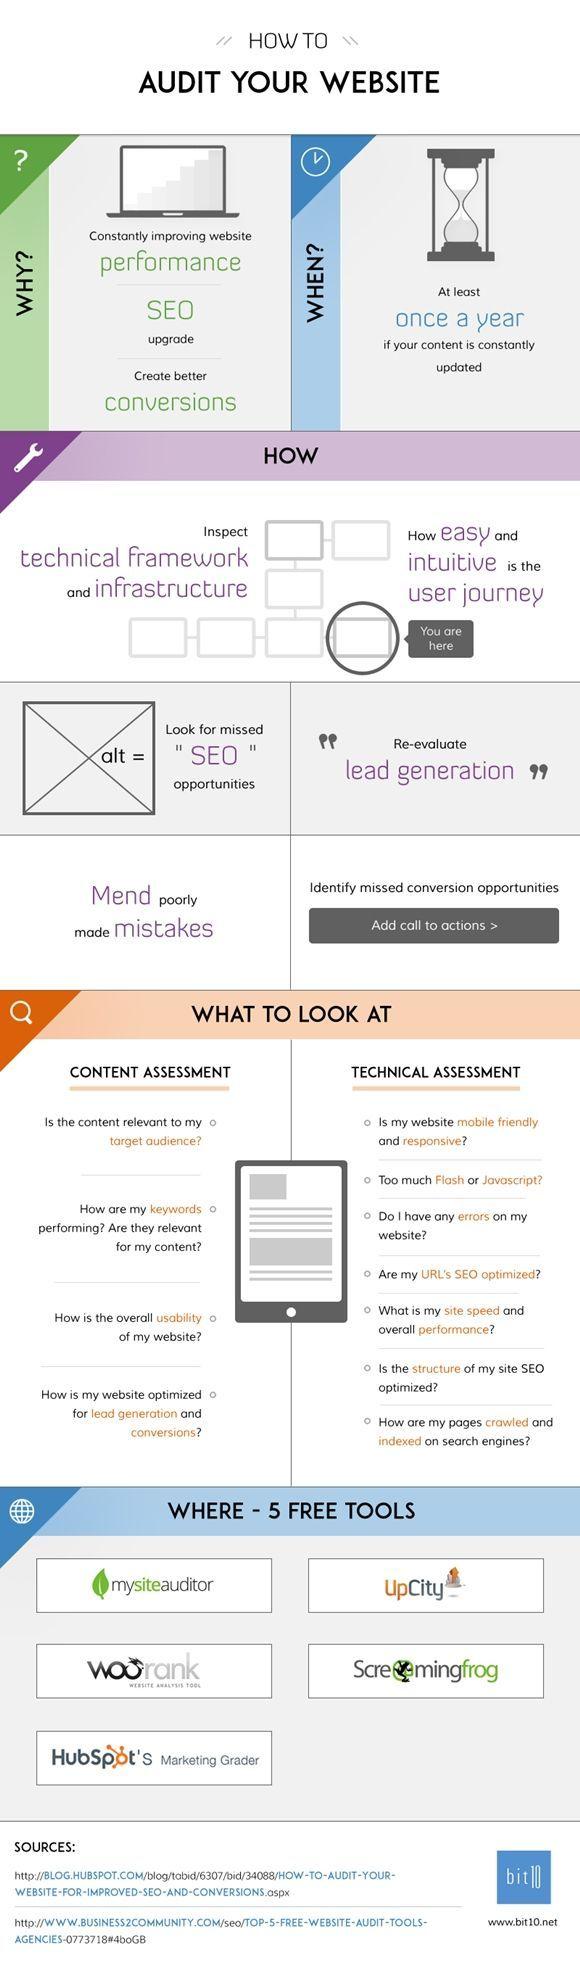 Cómo auditar tu web #infografia #infographic #marketing